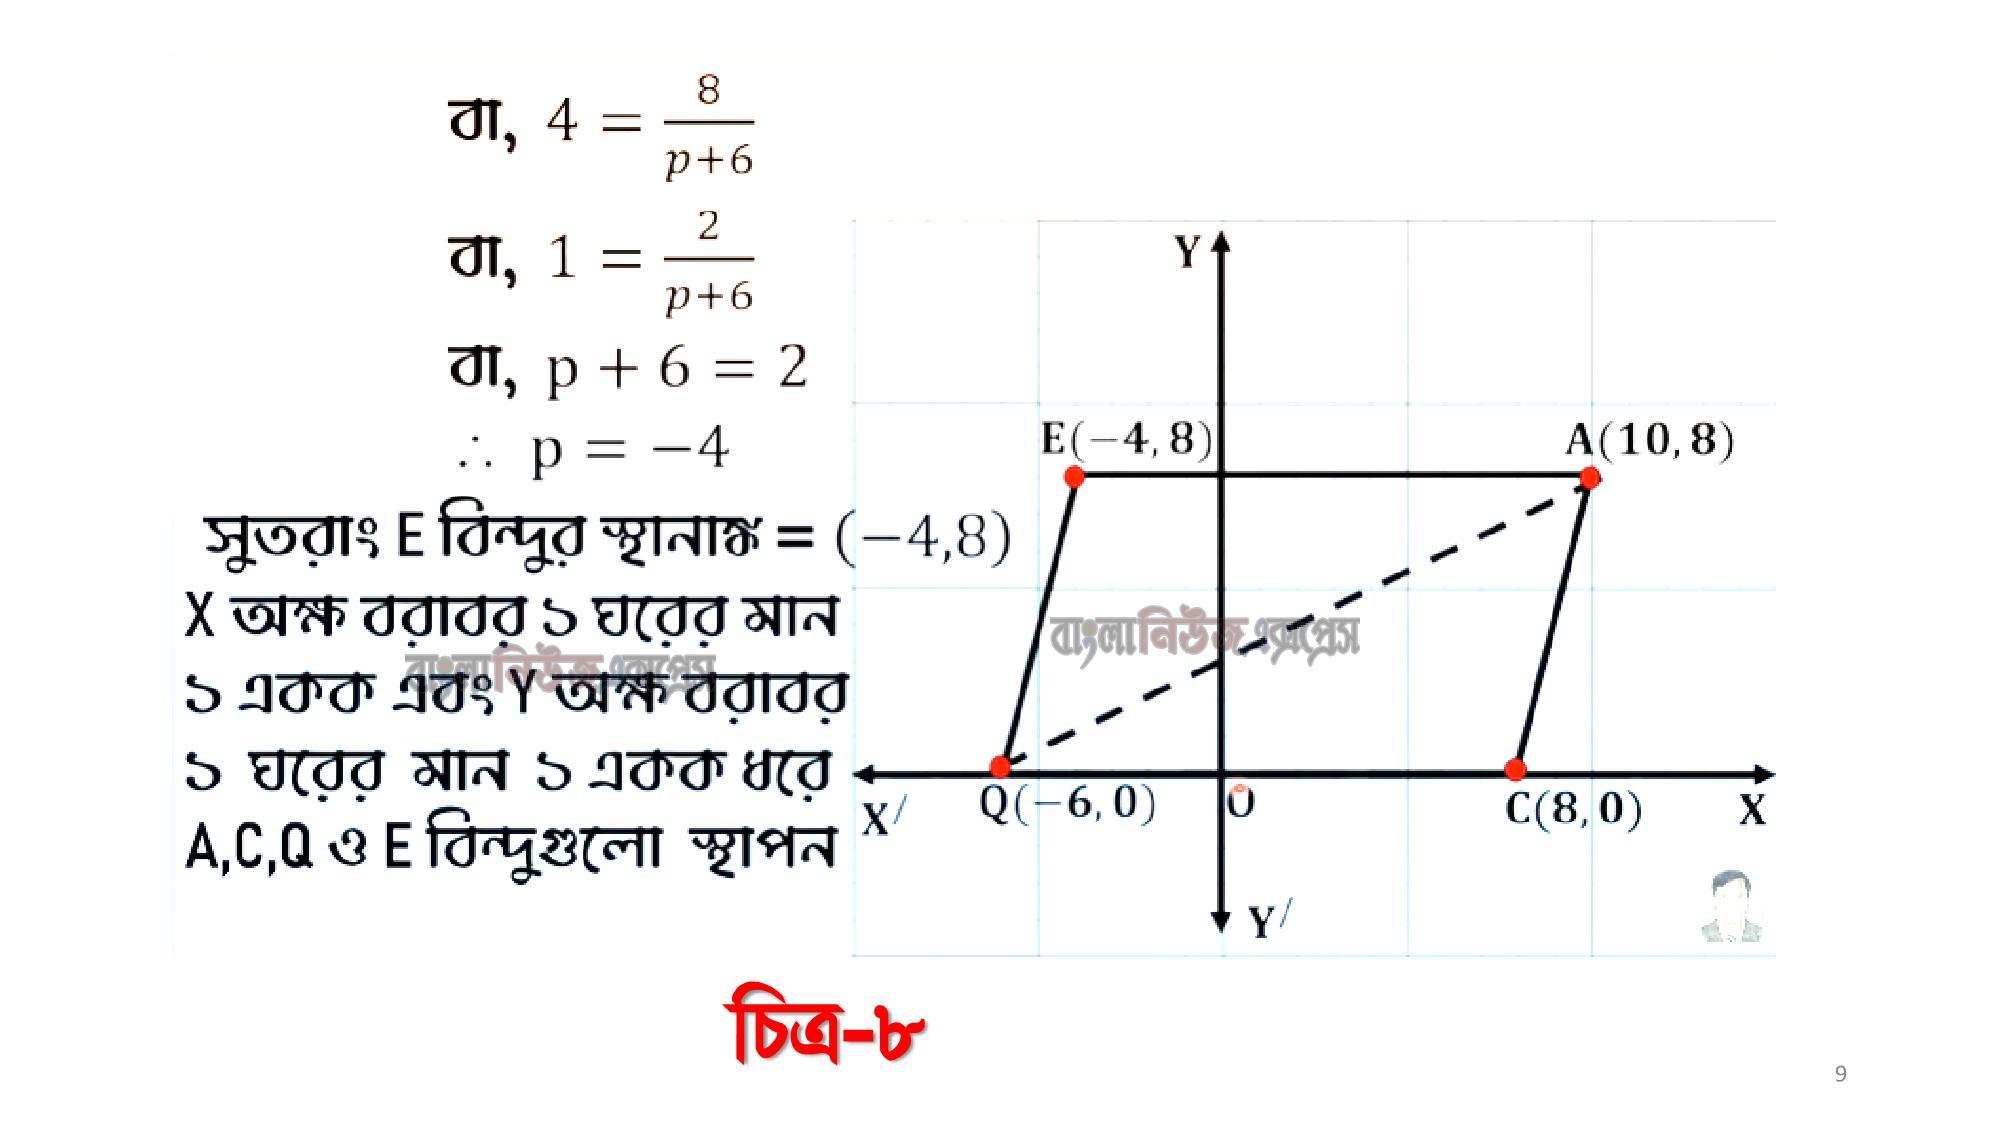 k এর মান নির্ণয় কর।, যদি 2y -X – 6 = 0 সরলরেখাটি CD রেখাকে P বিন্দুতে এবং y ও X অক্ষকে যথাক্রমে R ও Q বিন্দুতে ছেদ করে, তবে APQC এর ক্ষেত্রফল নির্ণয় কর। https://www.banglanewsexpress.com/